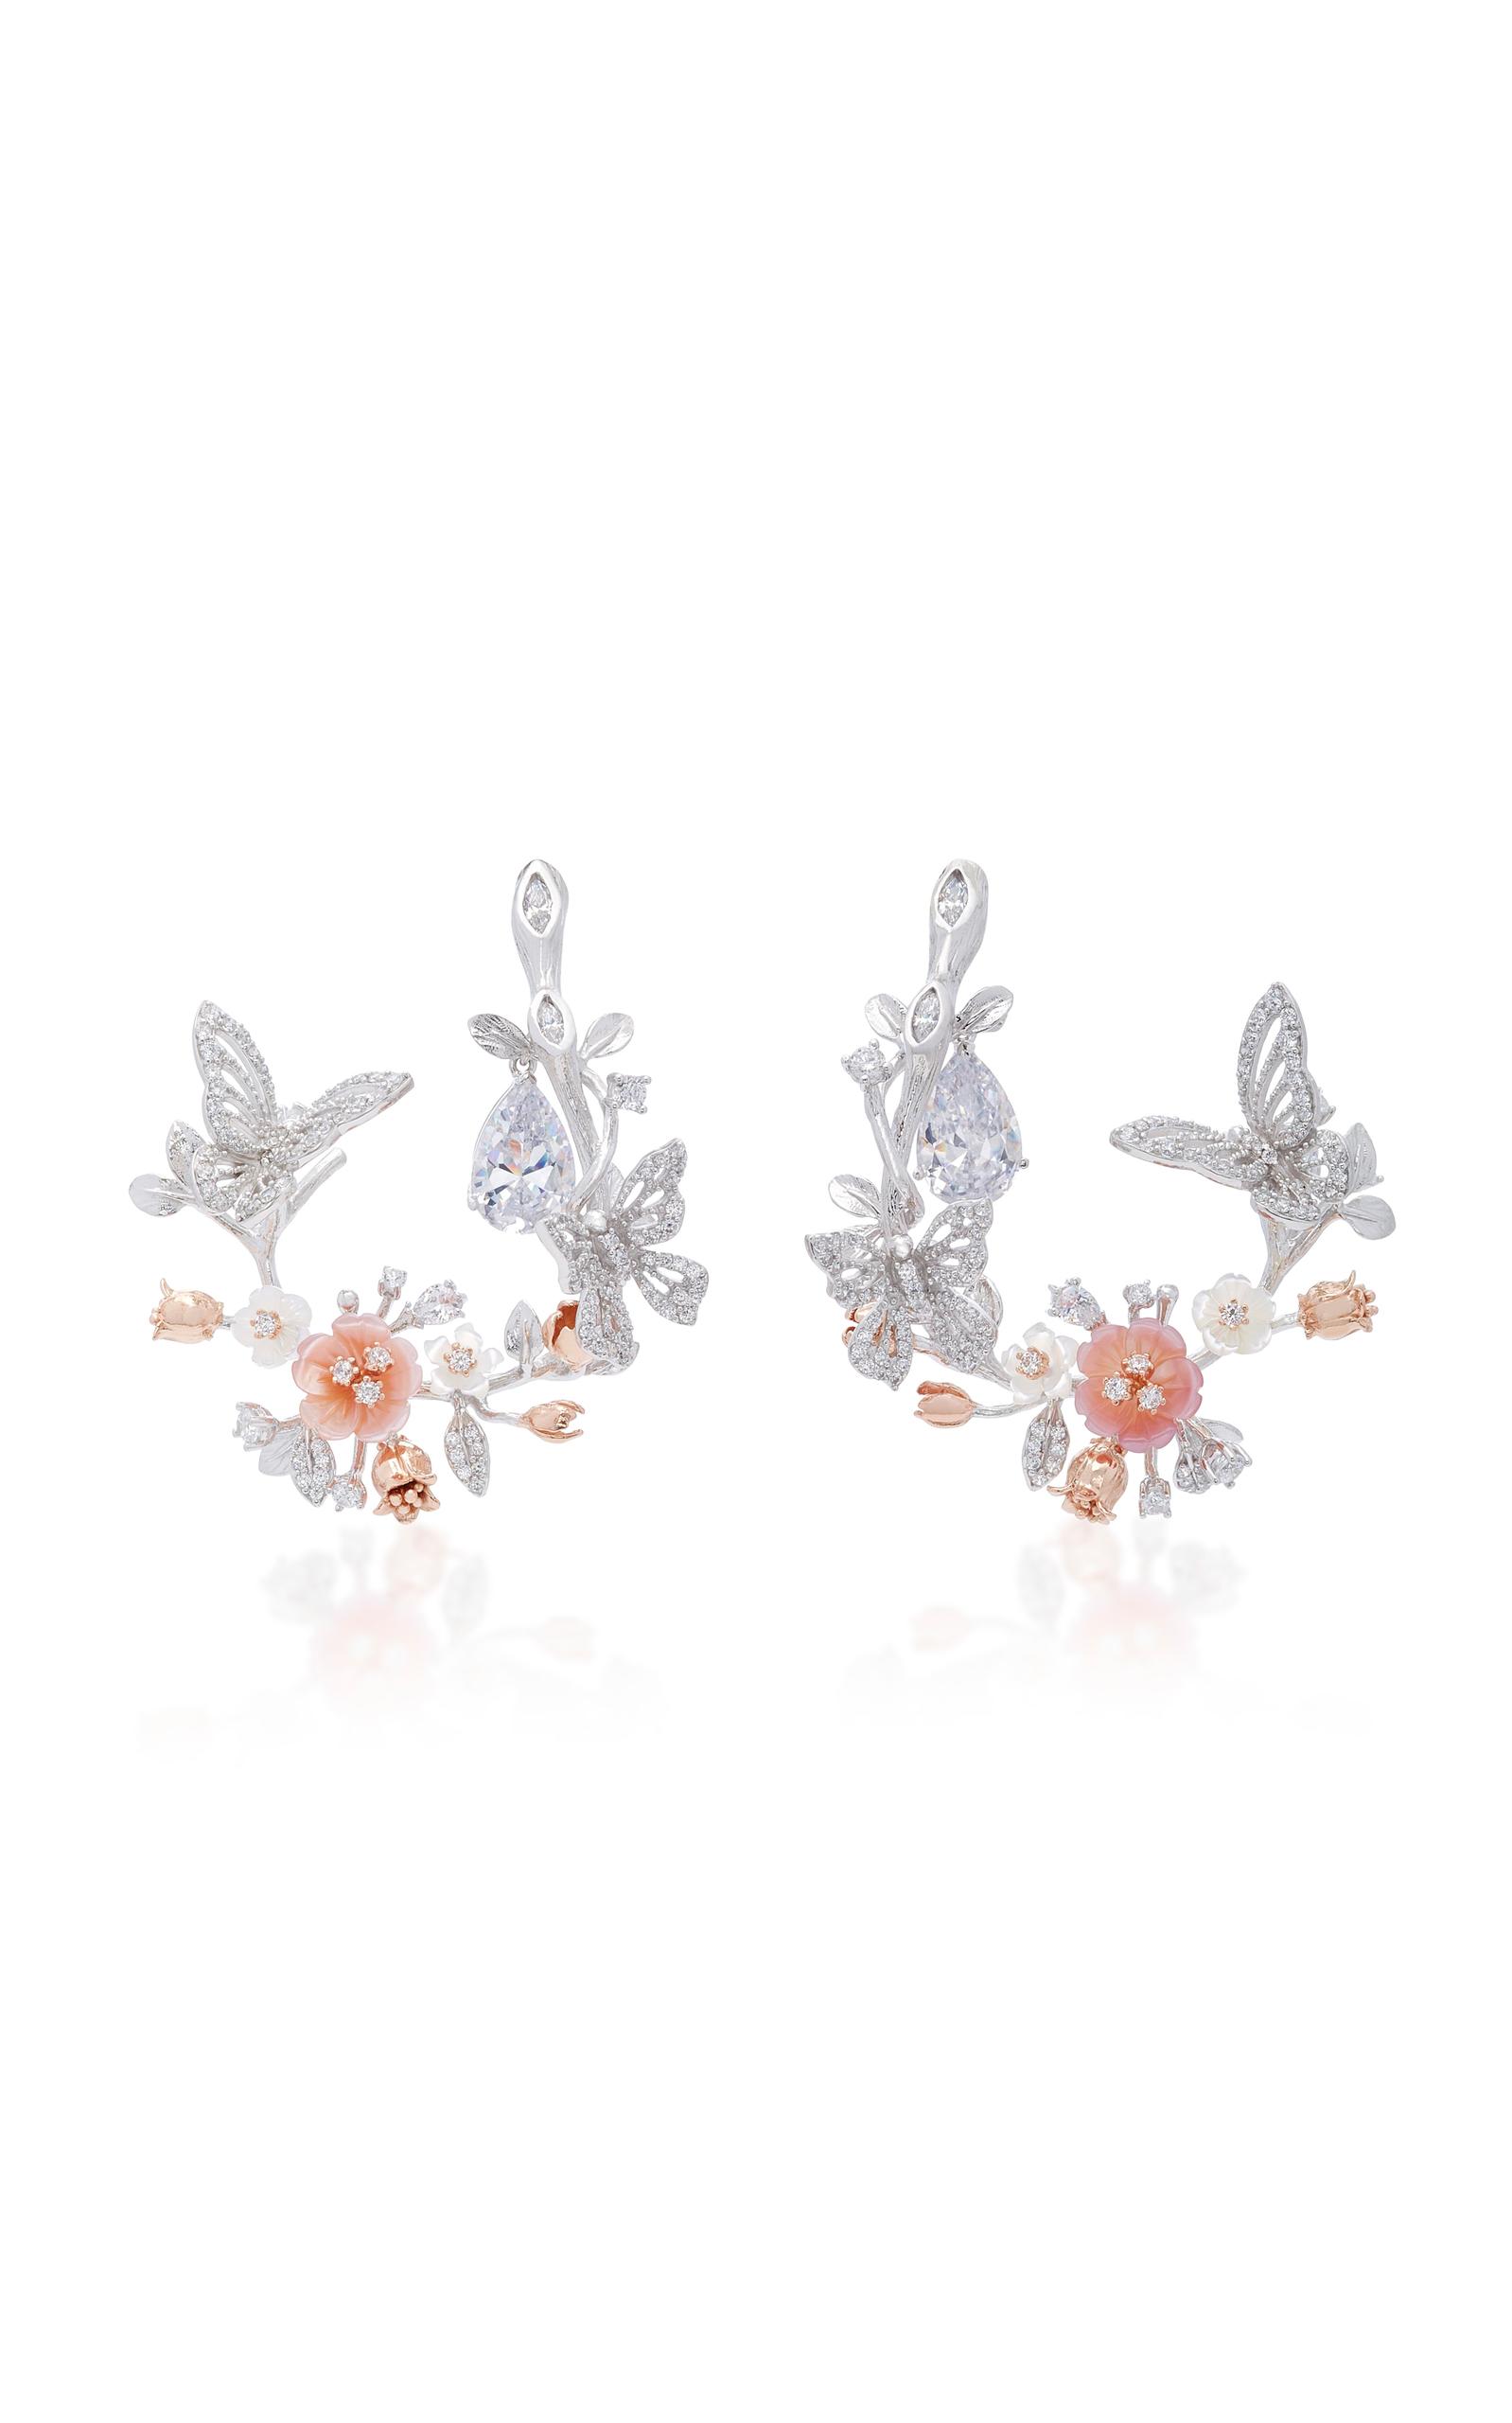 Women's Exclusive 18K White Gold Butterfly Garland Earrings